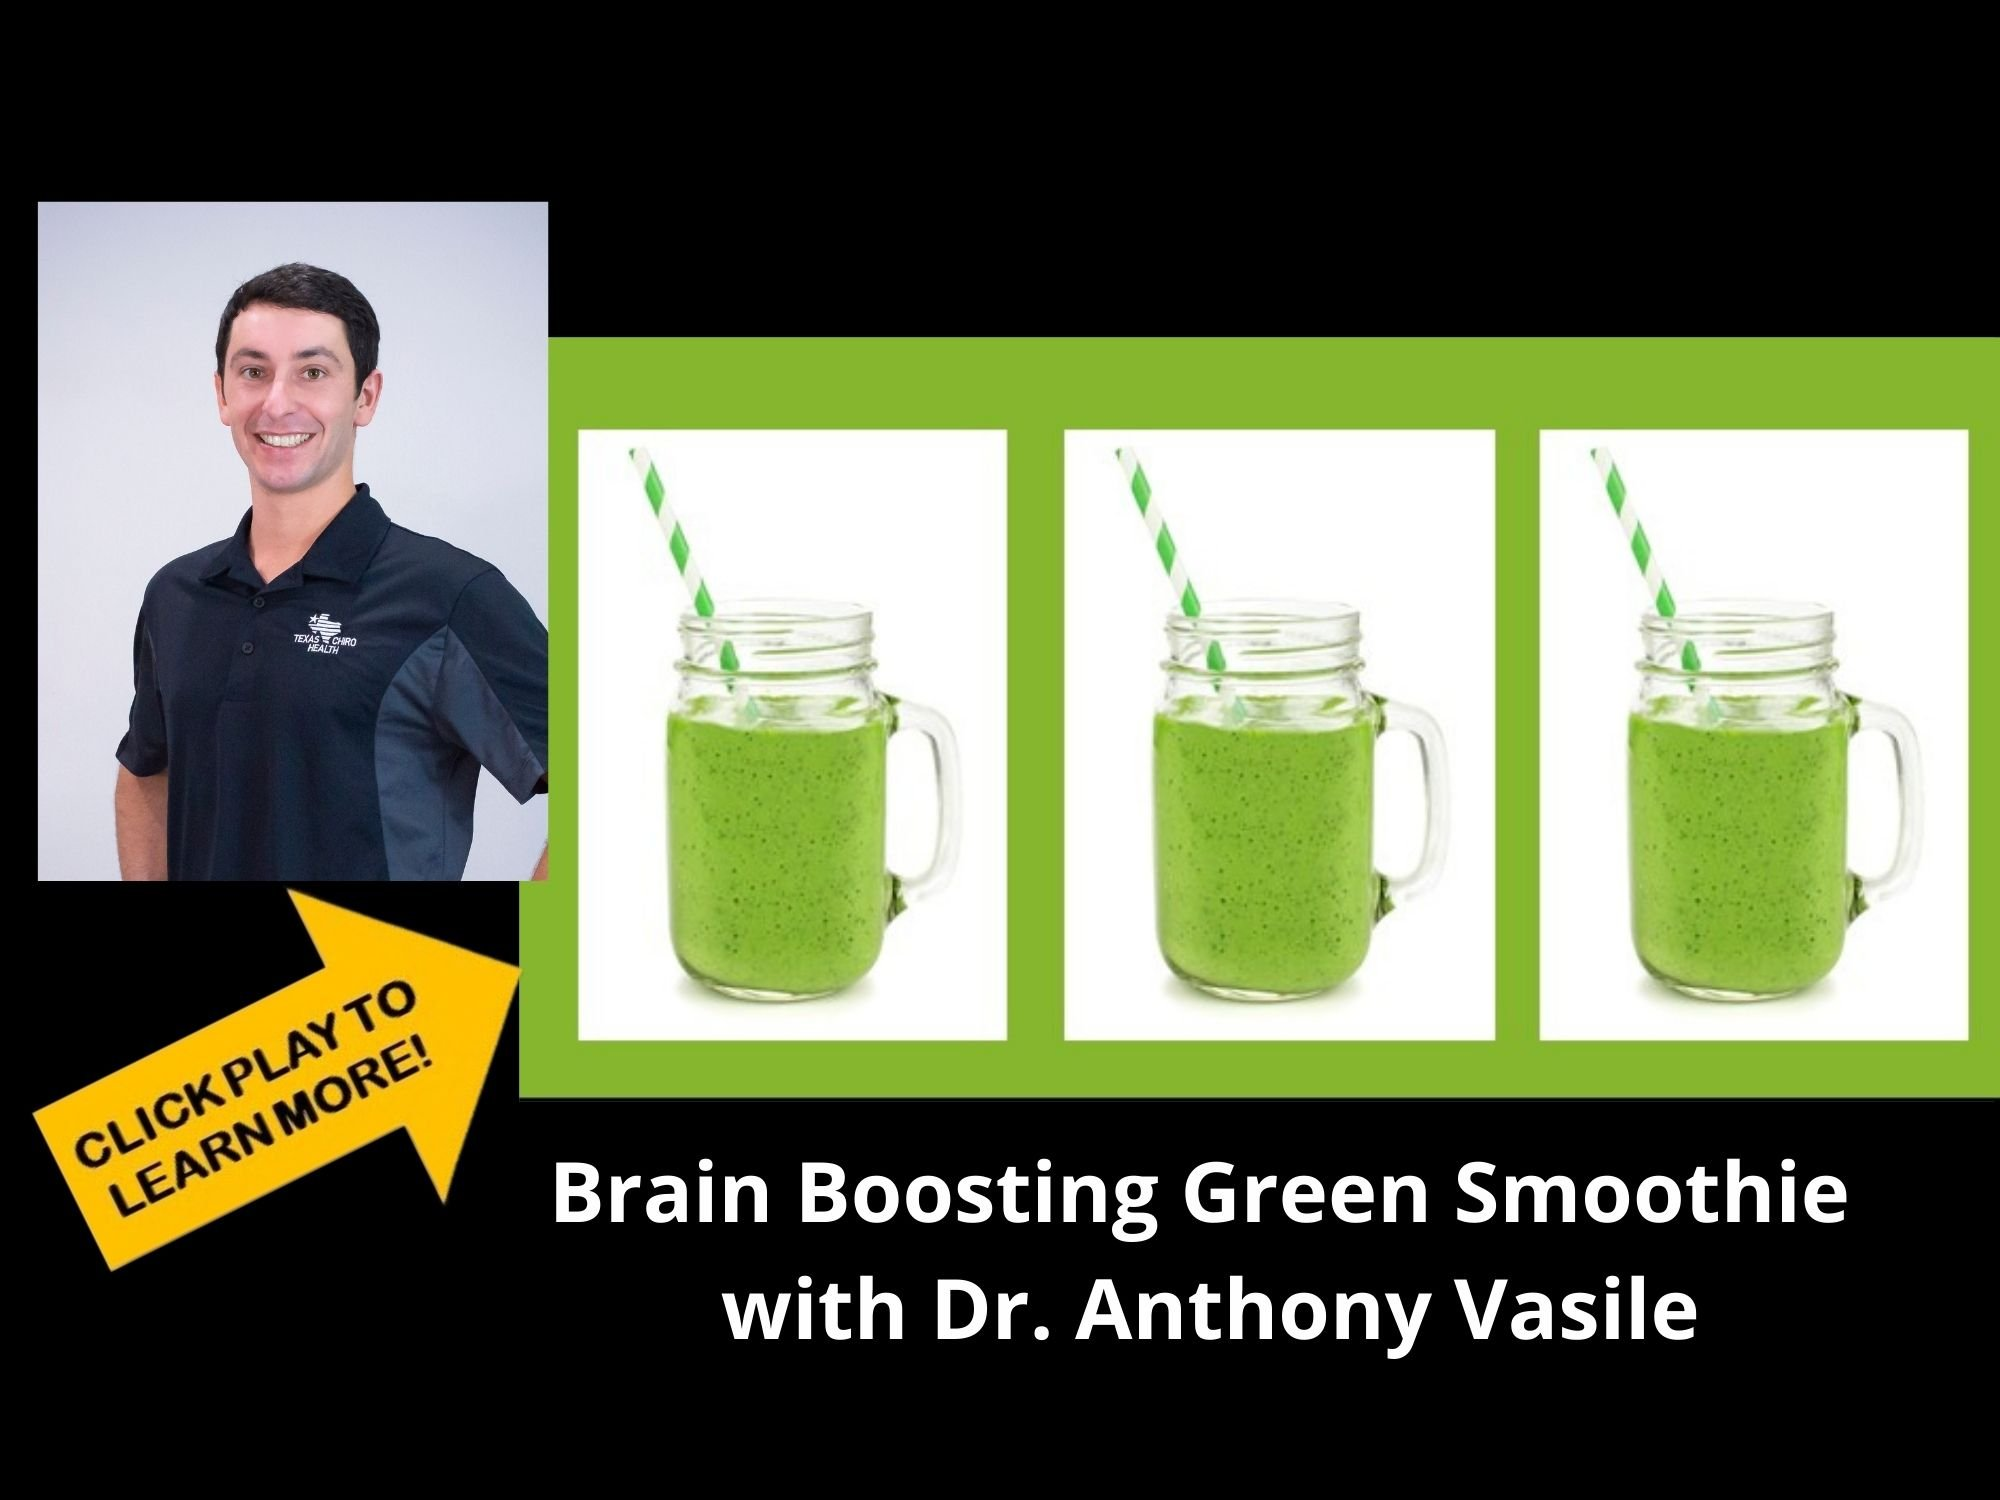 Brain Boosting Green Smoothie